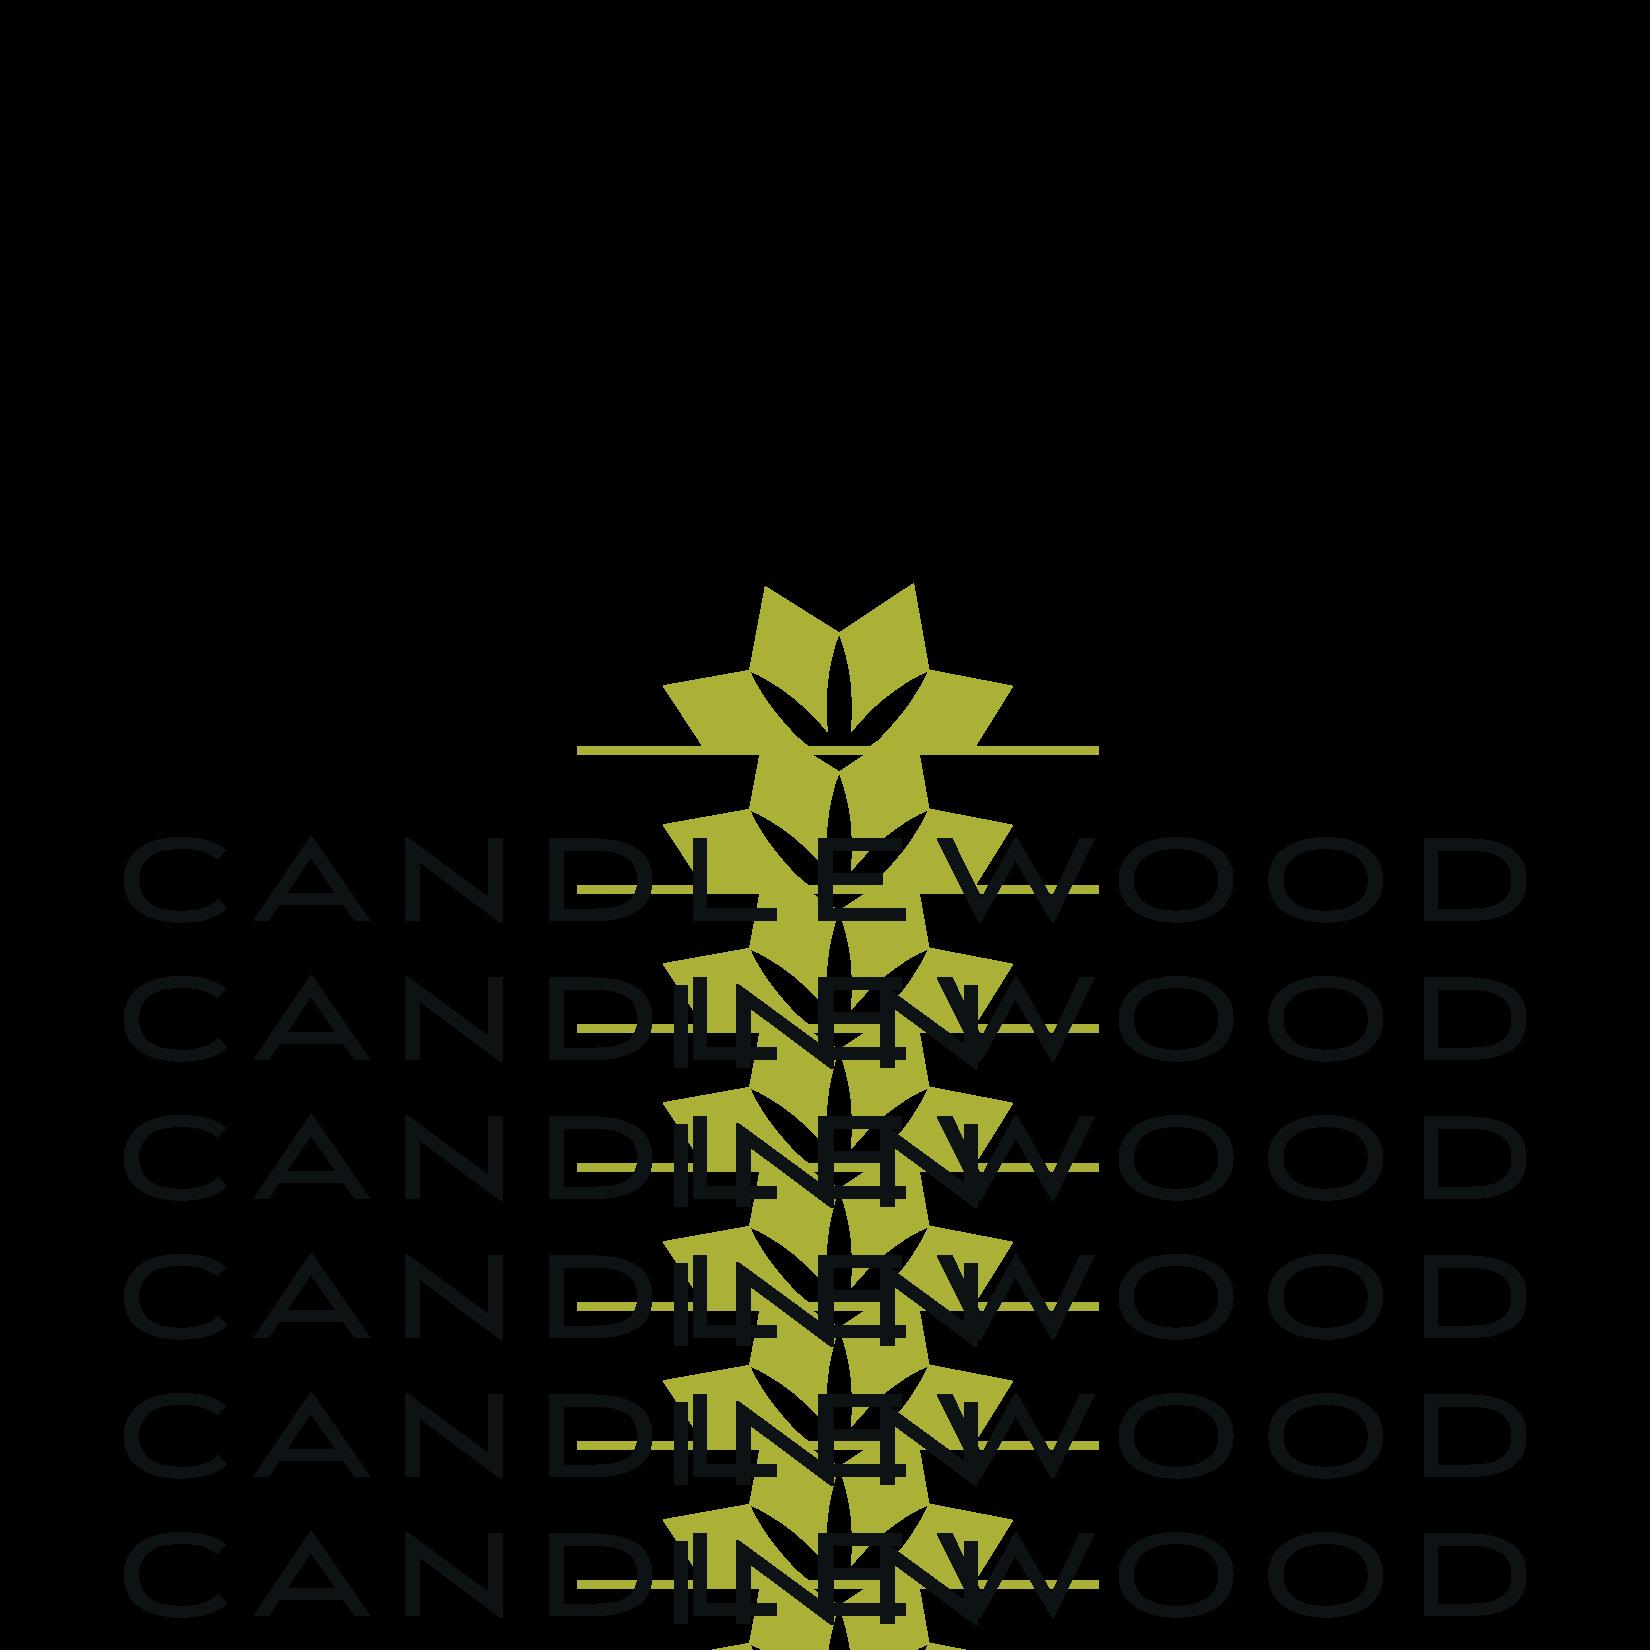 The Candlewood Inn